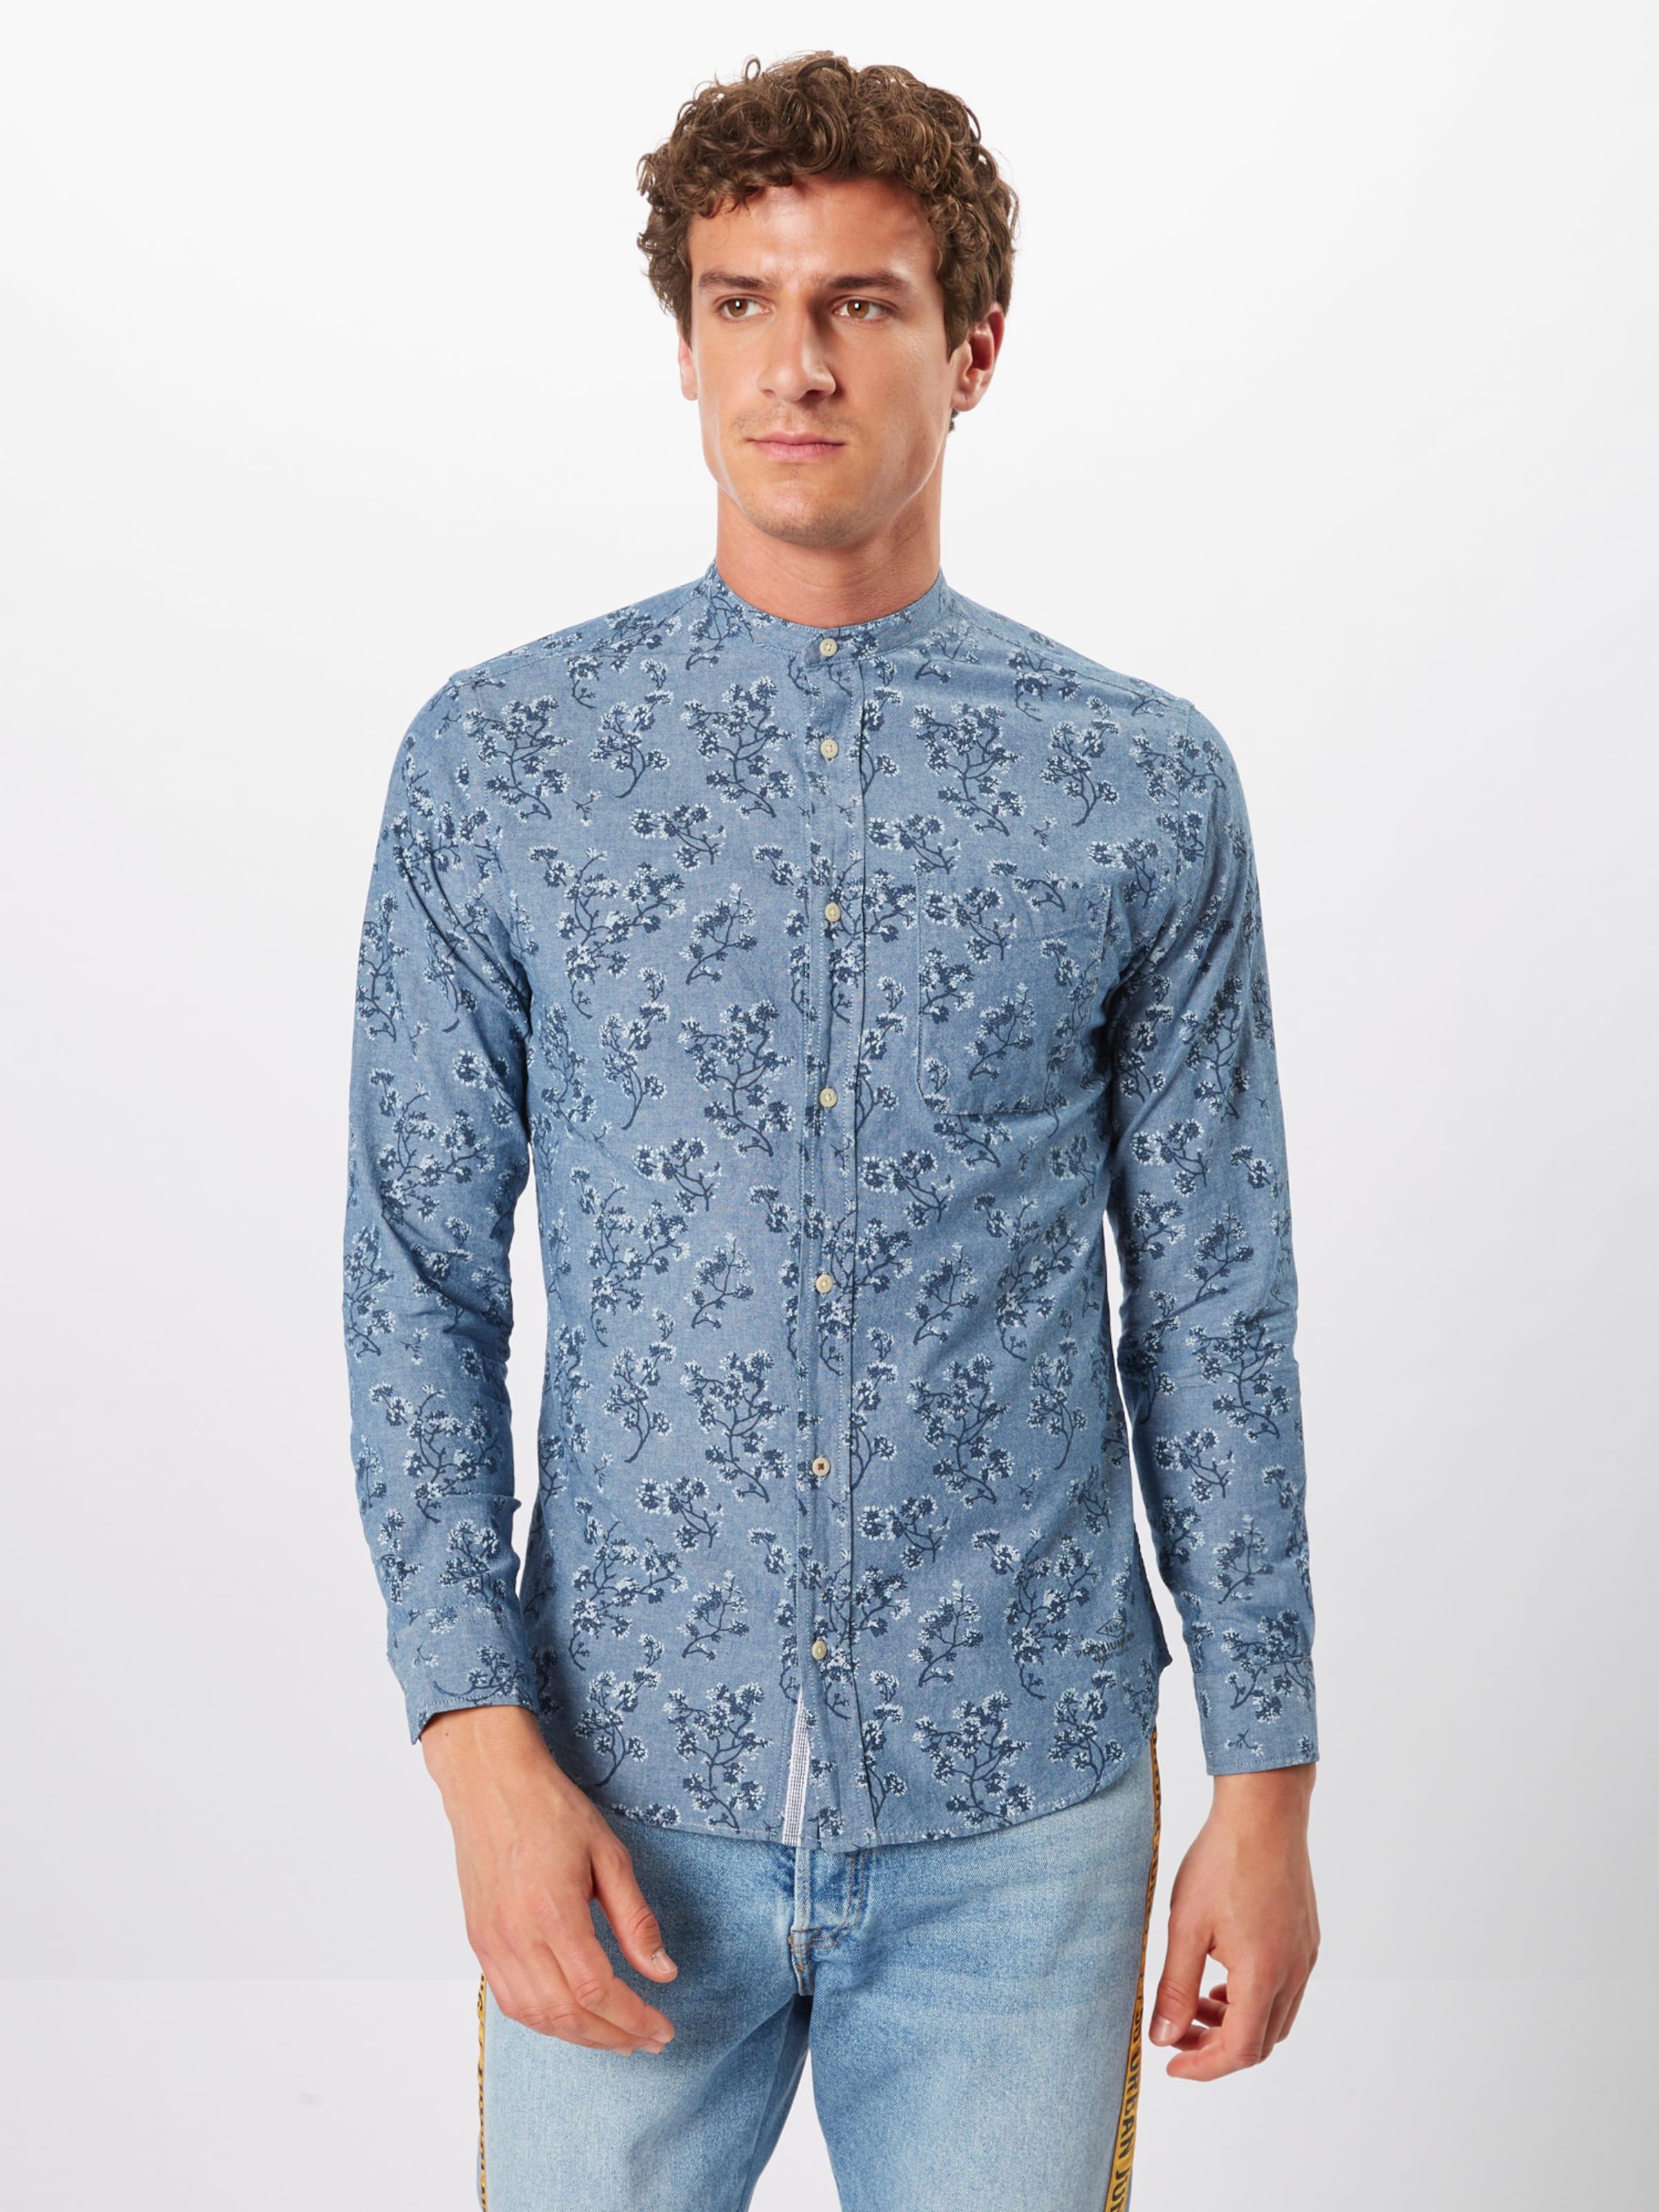 Shirt s Band One Jackamp; Jones 'jprderek Chemise L BleuFoncé En Pocket' QBoEWCerxd